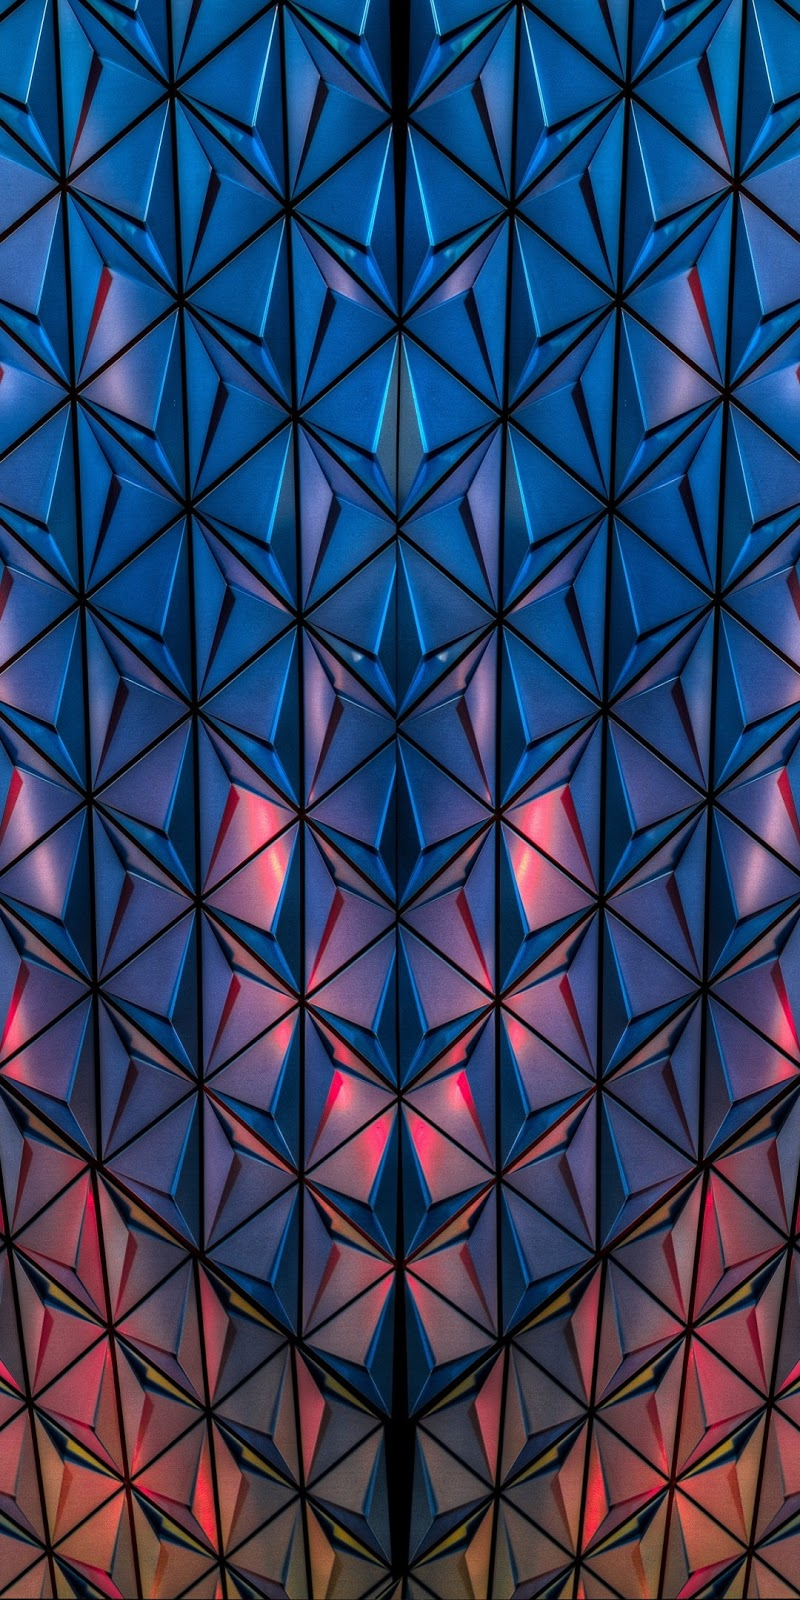 Download Redmi Note 5 Pro Full Hd Wallpapers Motivatingtechnology